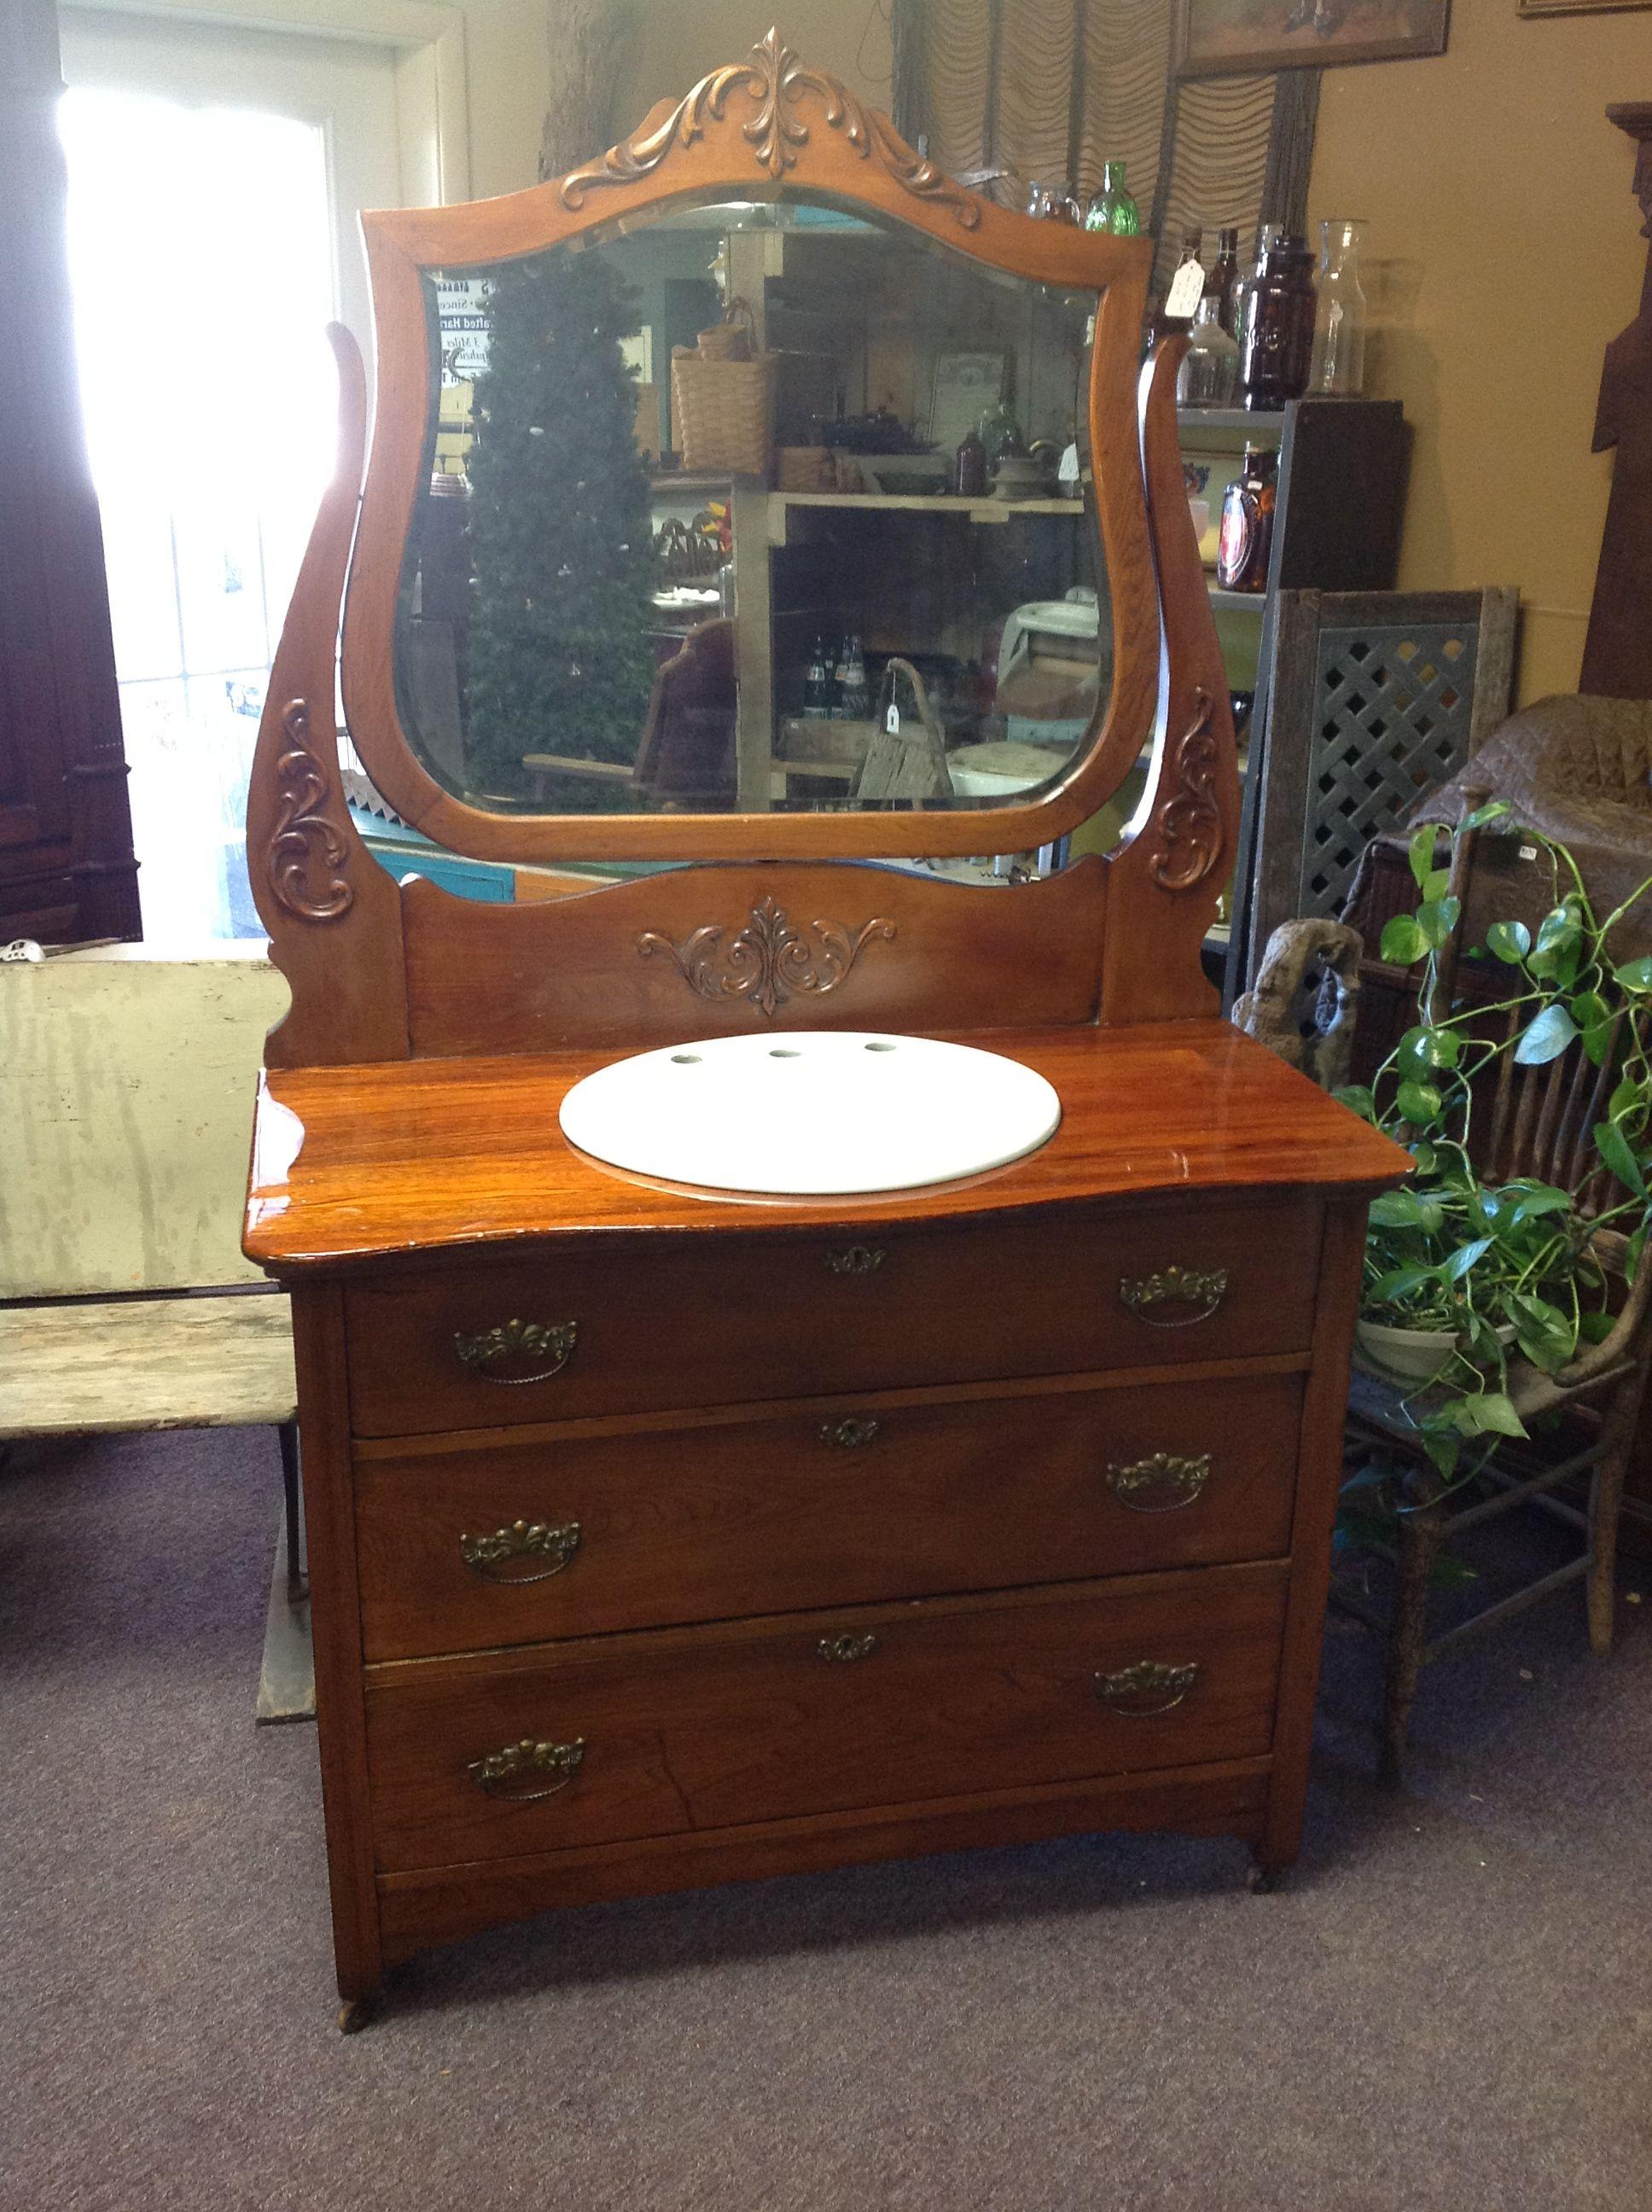 Old Antique Dresser Repurposed Into A Bathroom Sink Vanity